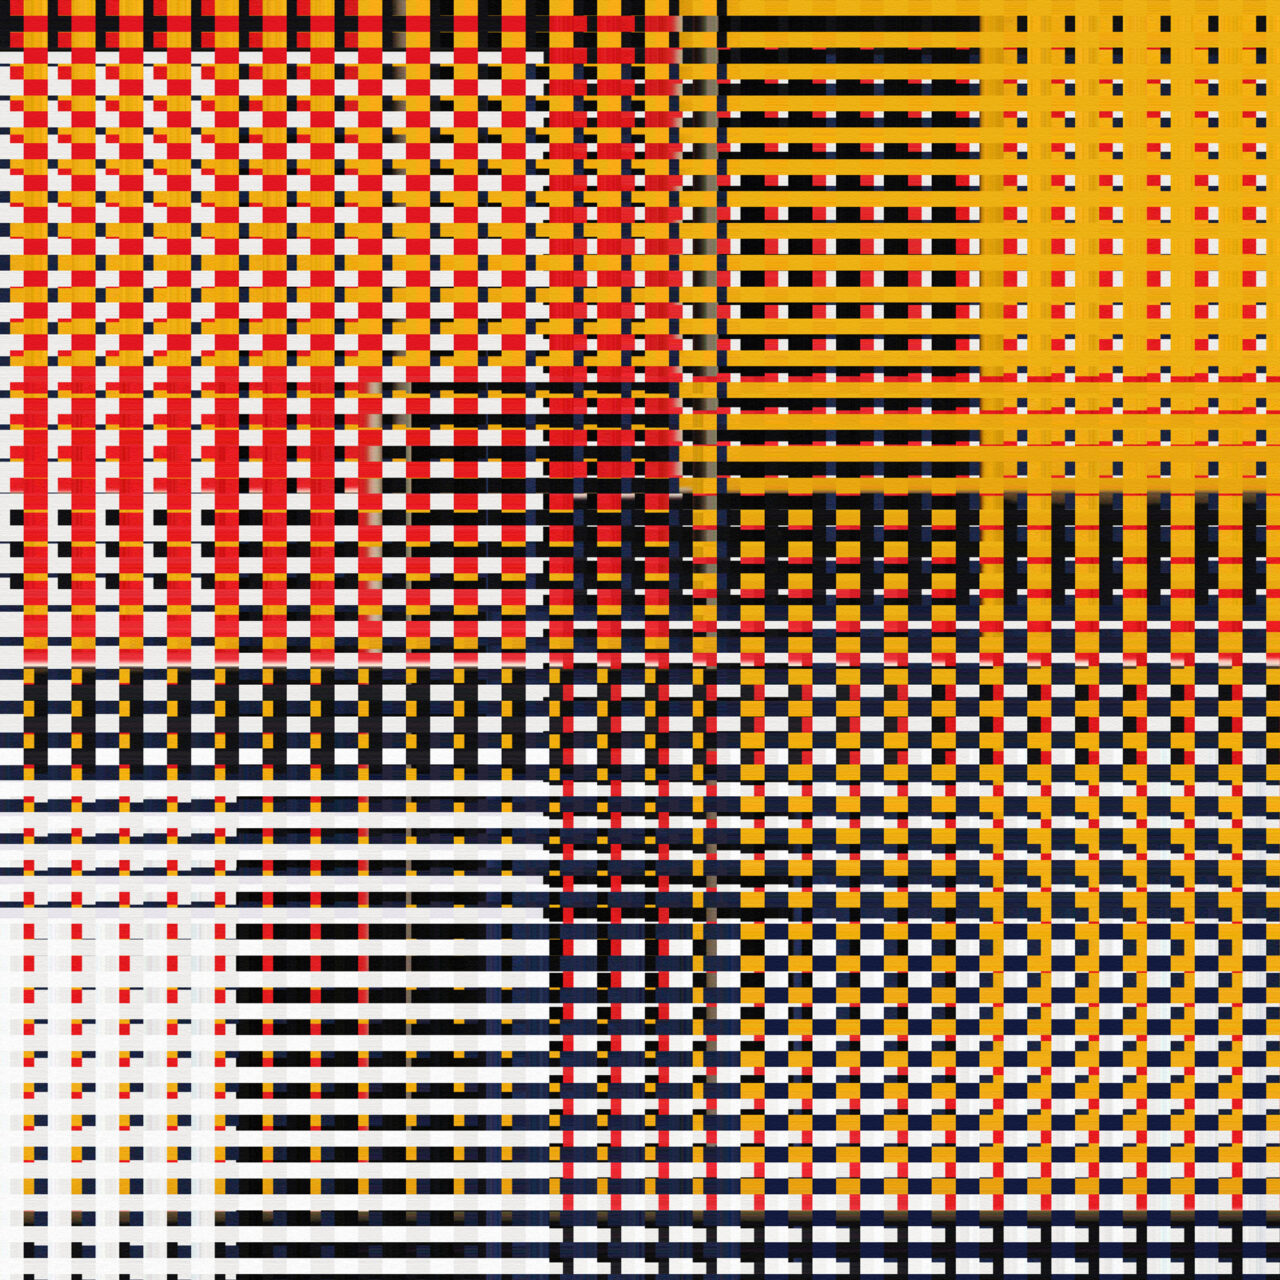 Visueller Text, 2019, nominiert für den  6. Internationalen Evard-Preis 2021, Experimental Fine Art Phtography, Mixed Media, 120 cm x 120 cm, Farbpigment auf Aludibond, matt